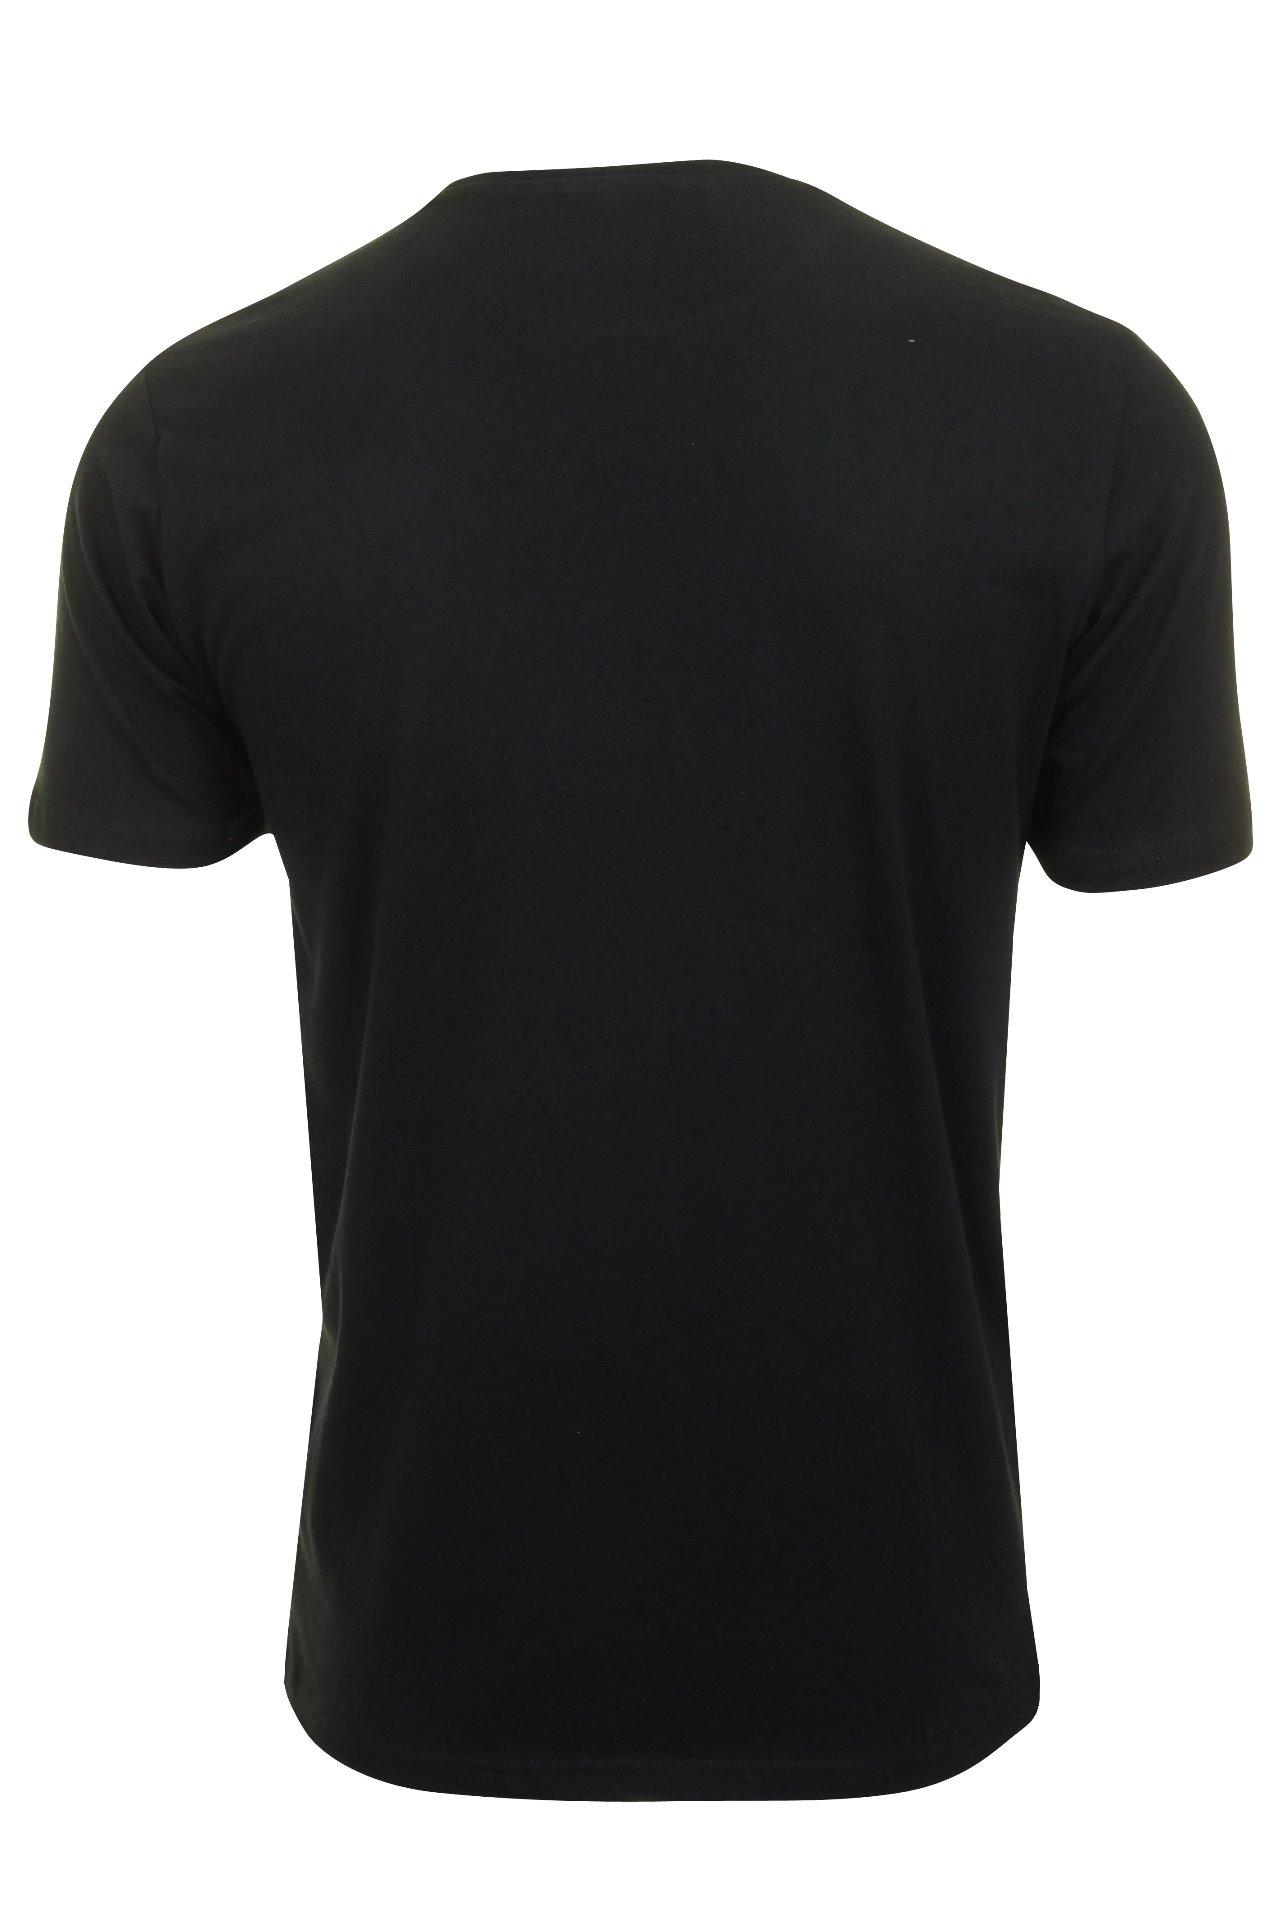 Para-Hombre-Ellesse-Camiseta-de-manga-corta-039-Canaletto-034 miniatura 5